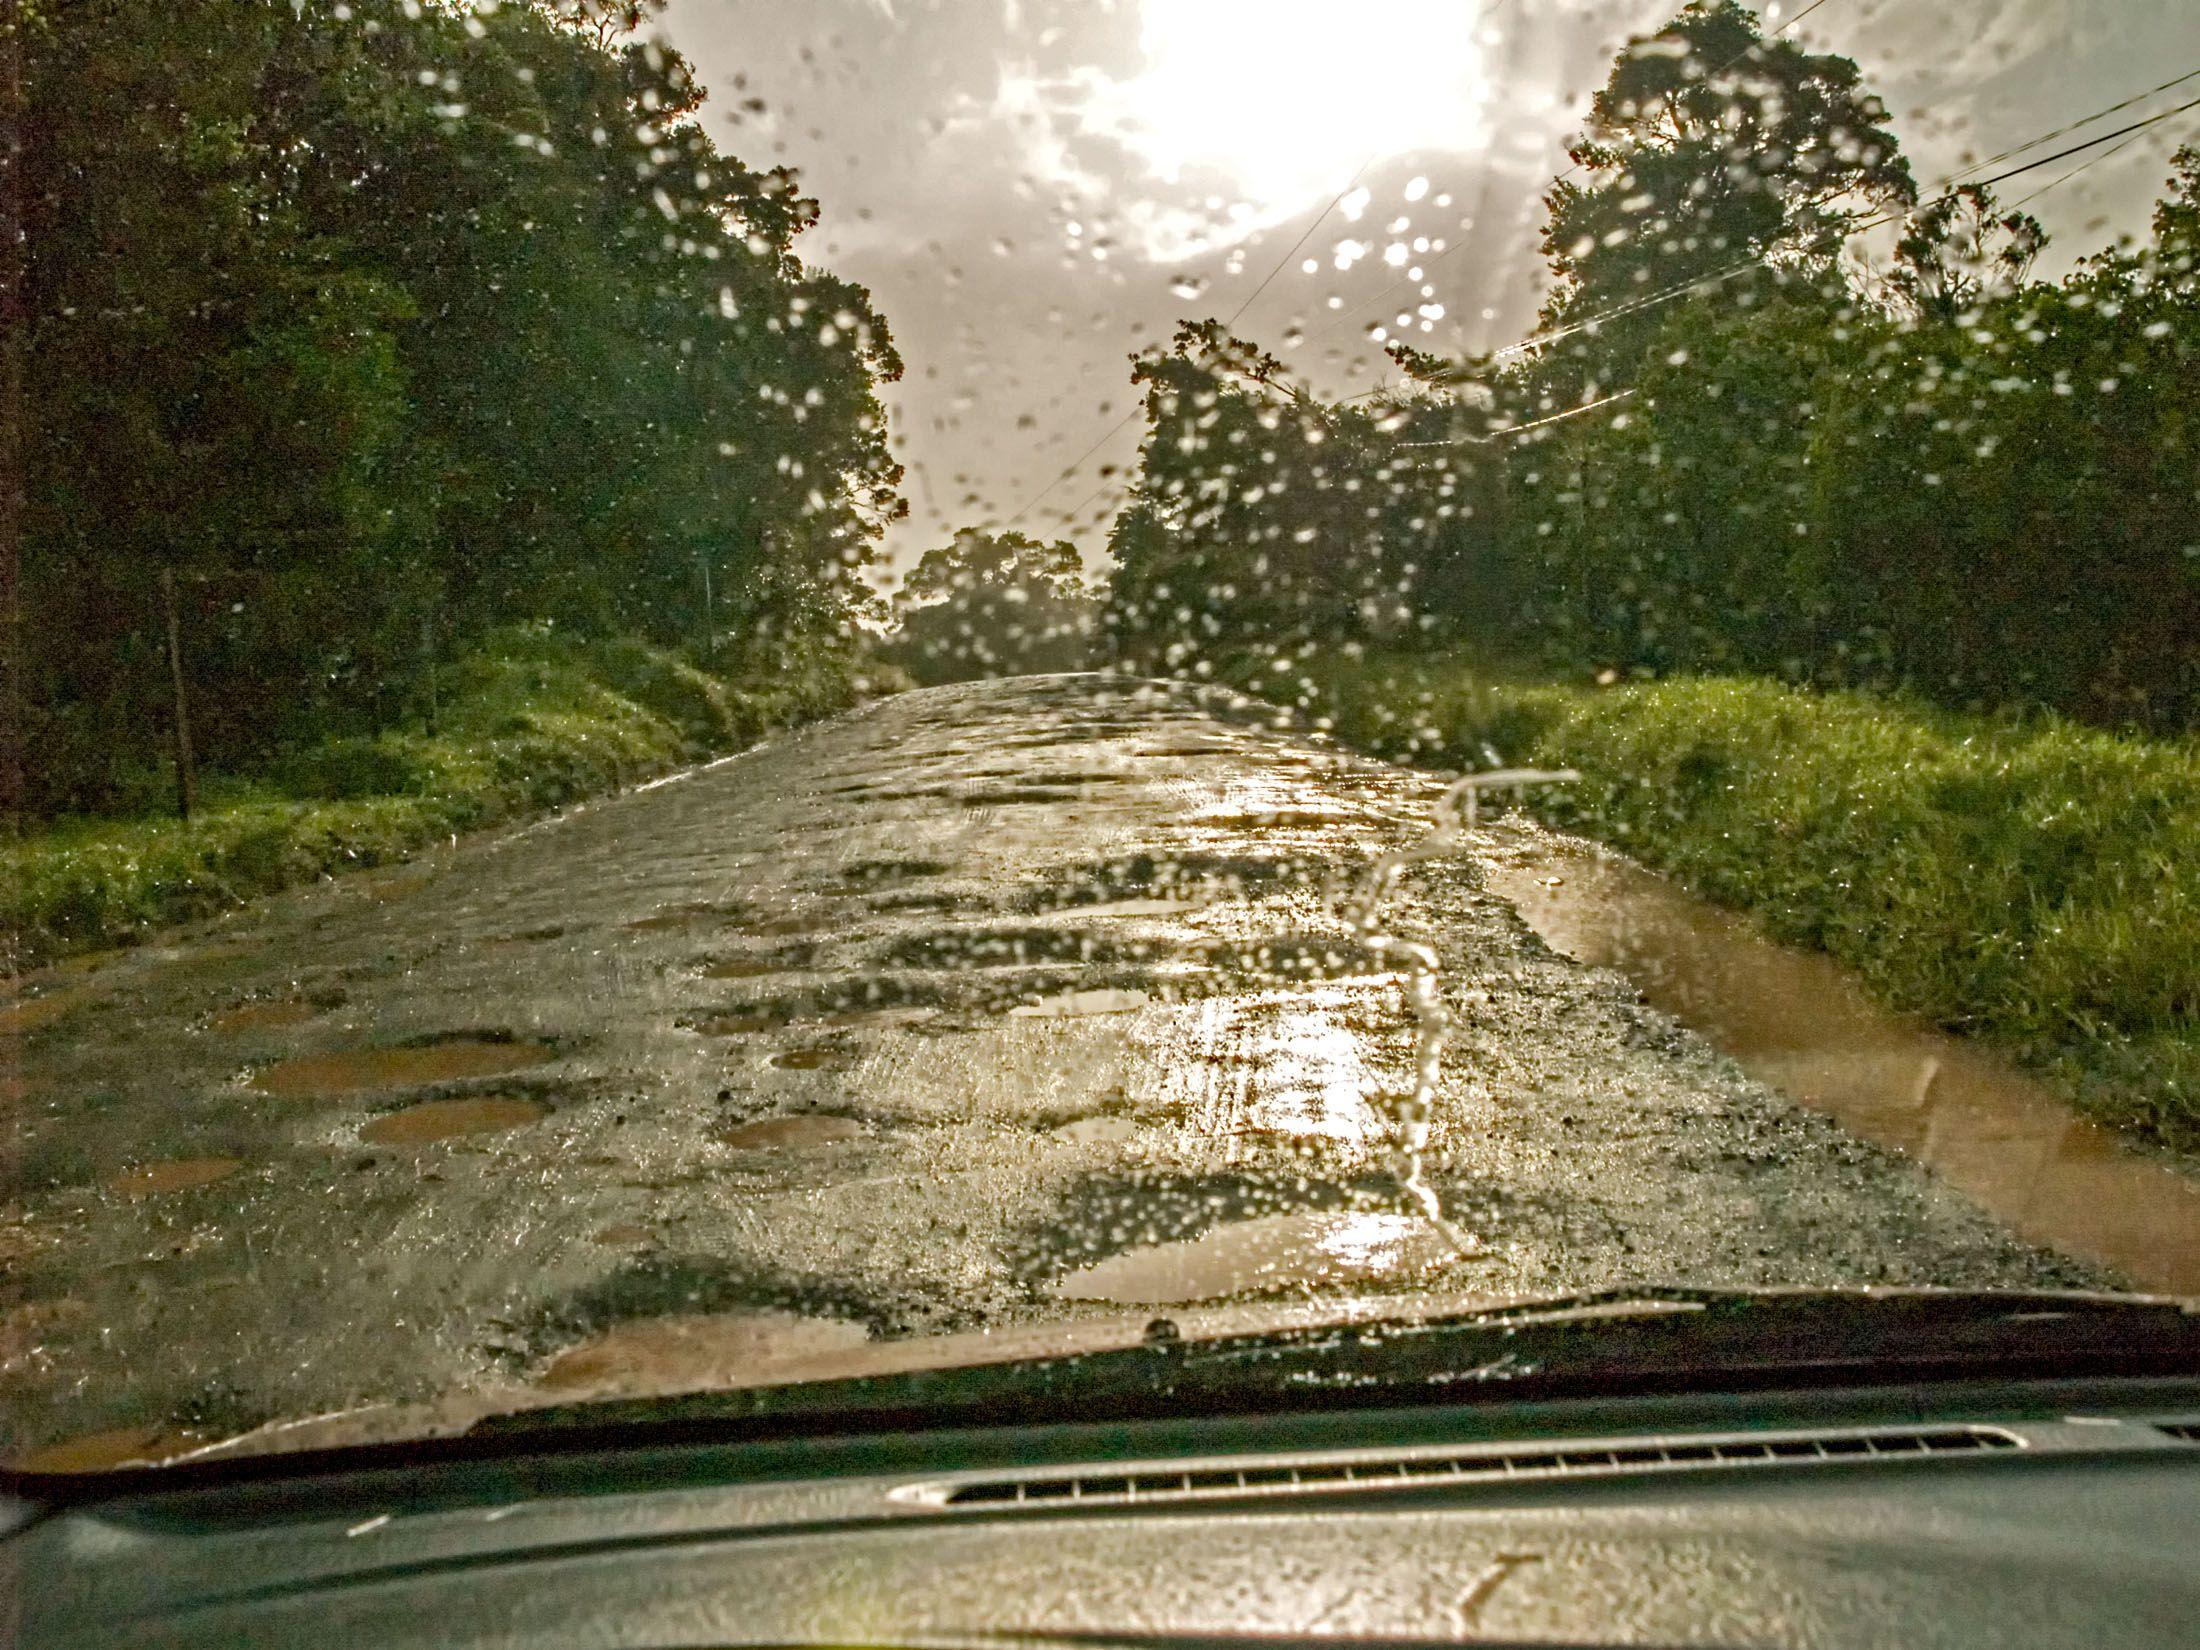 pothole road from car-Edit-2.jpg